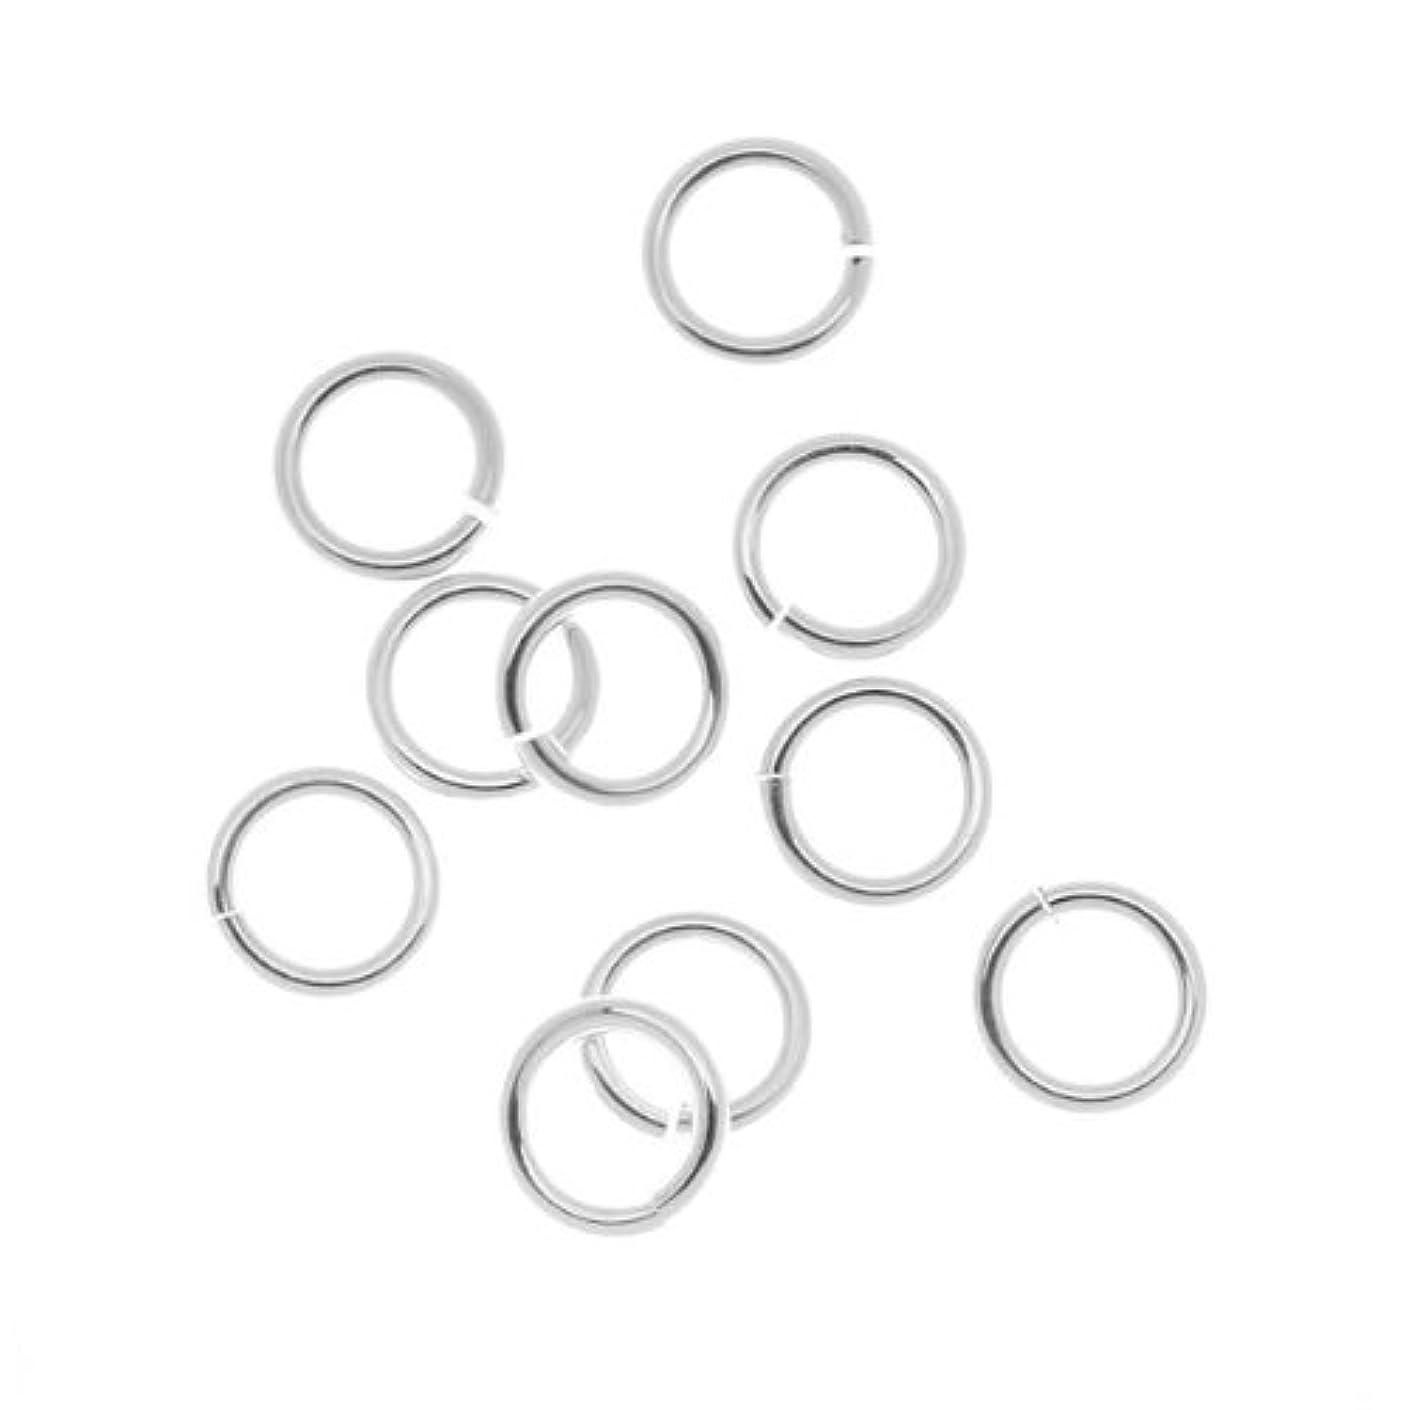 Beadaholique 10-Piece Sterling Jump Lock Rings, 8mm, 16-Gauge, Silver